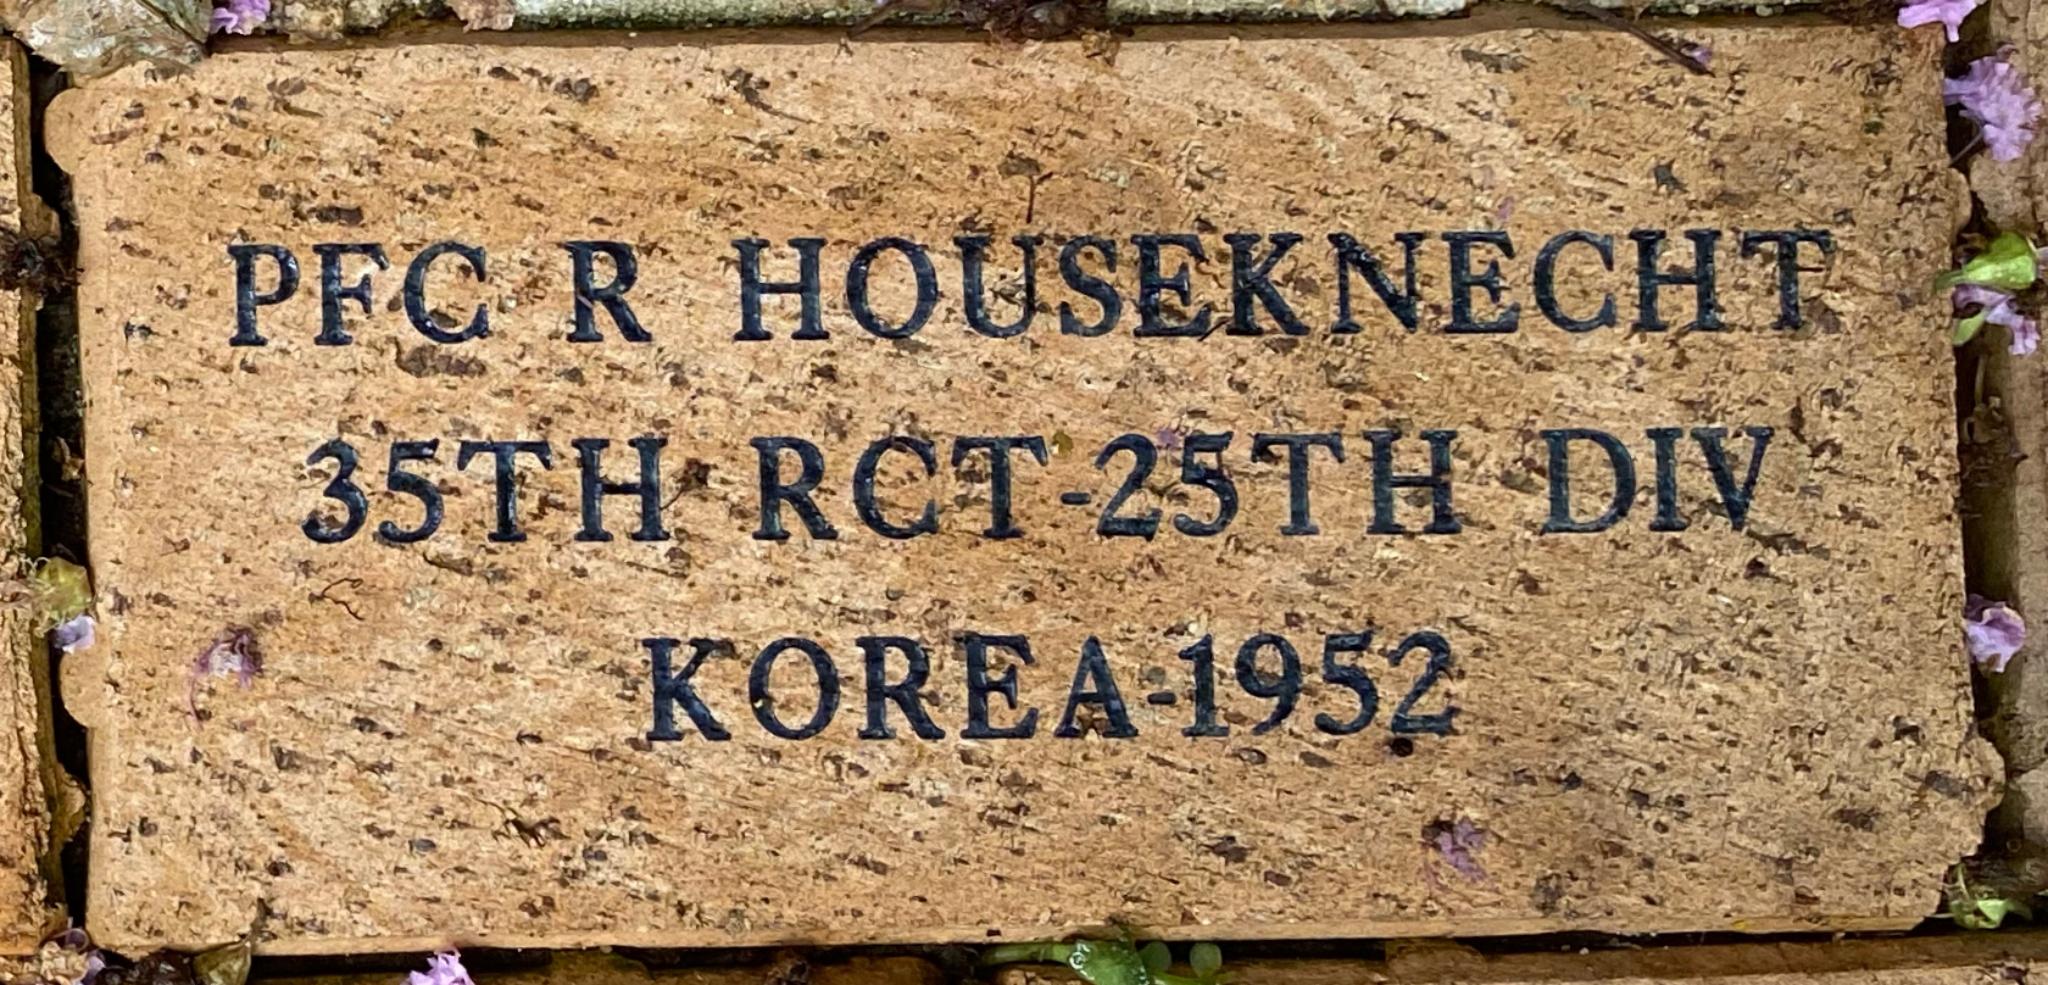 PFC R HOUSEKNECHT 35TH RCT-25TH DIV KOREA – 1952